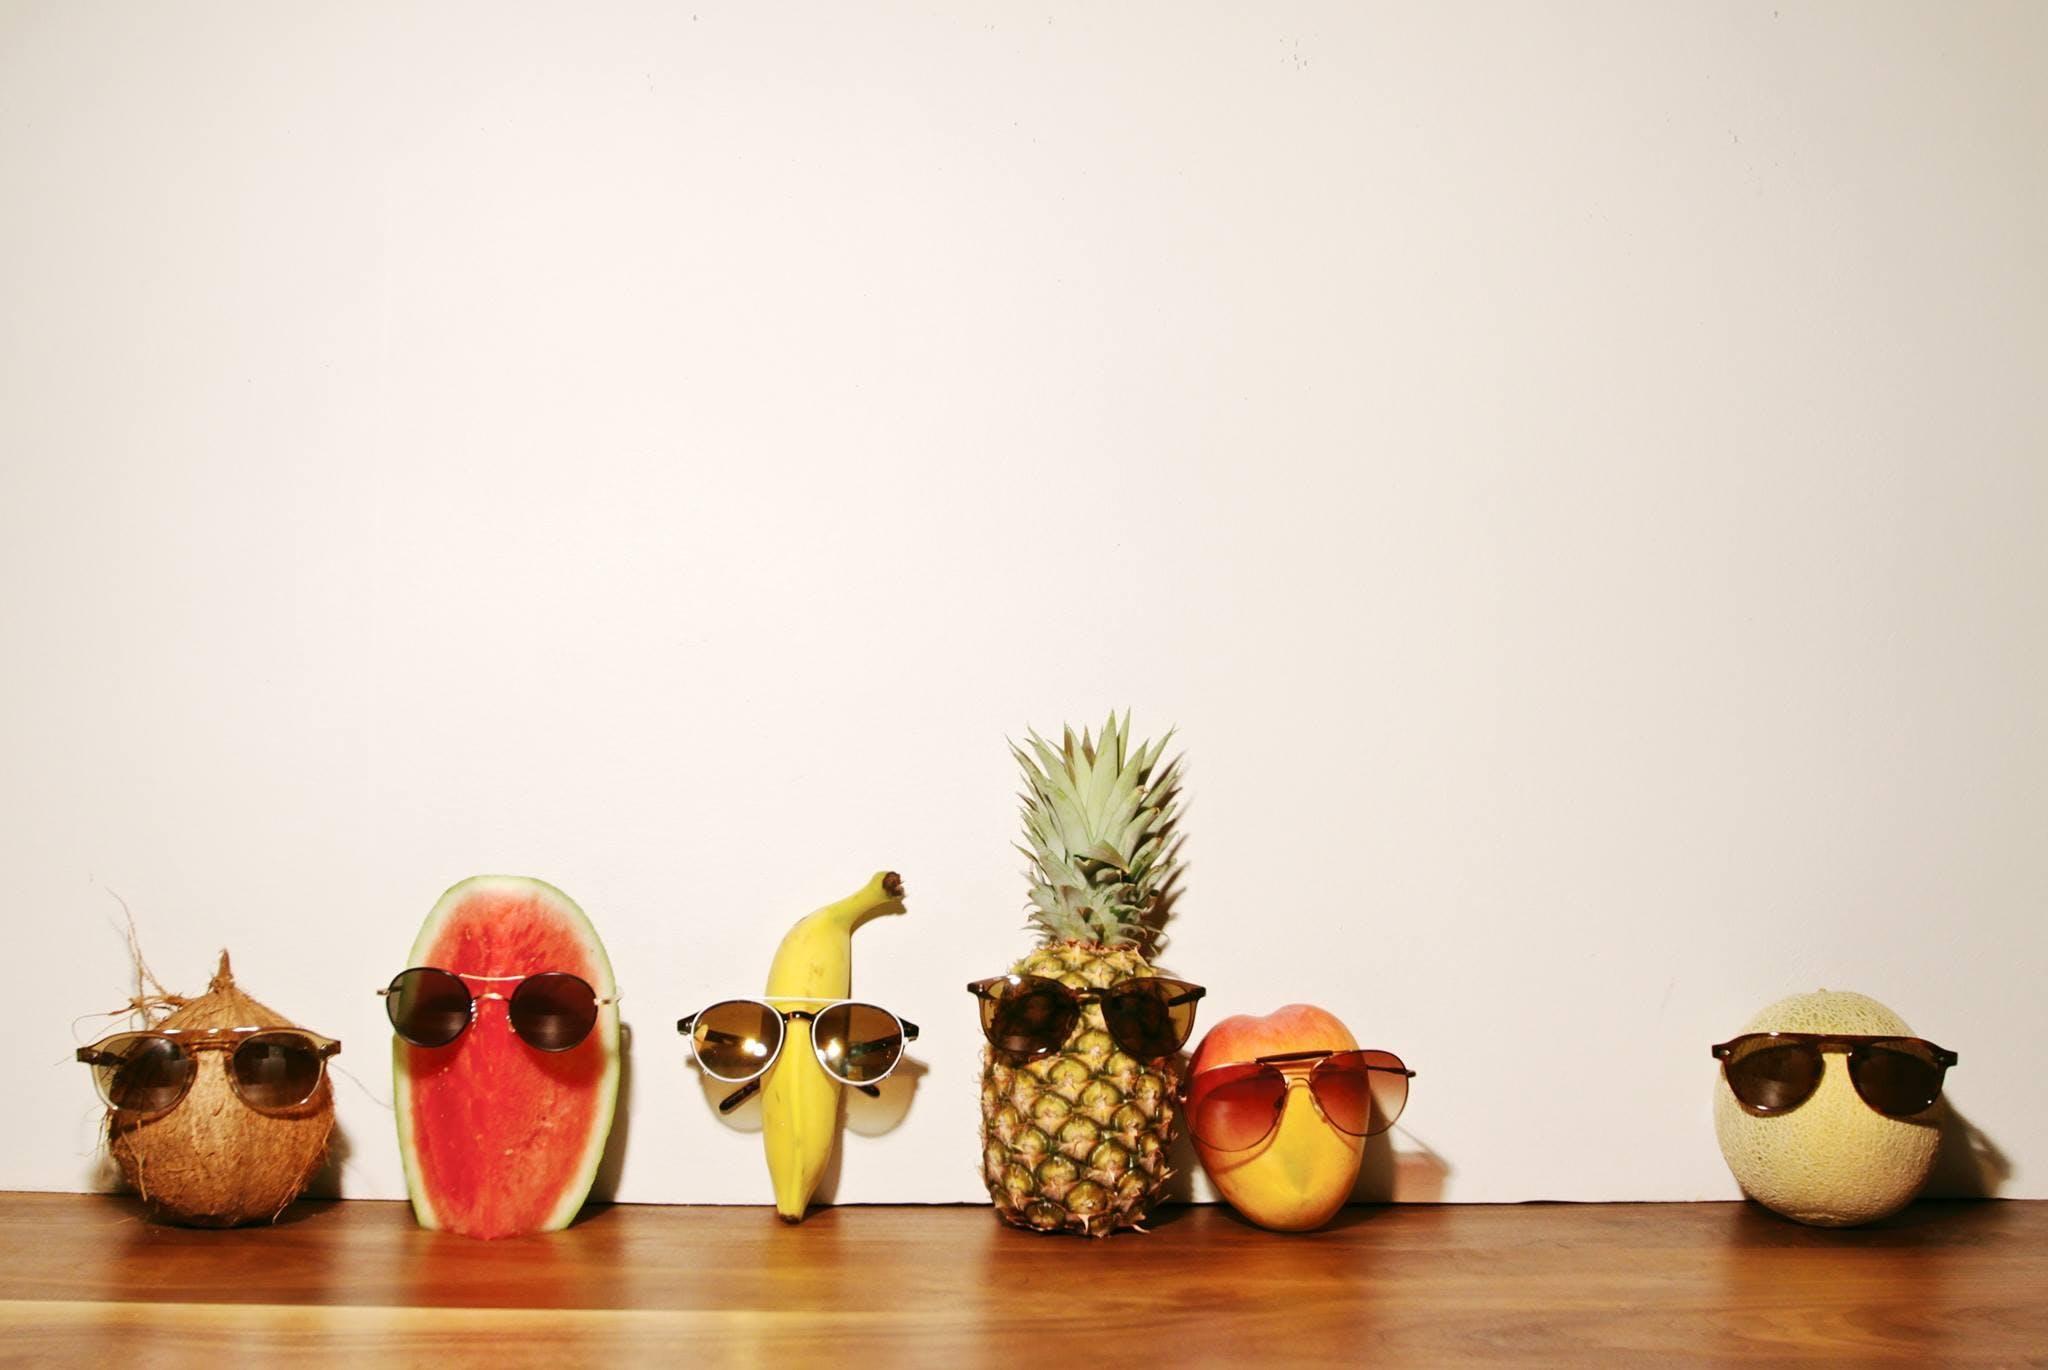 FruitTreeProject